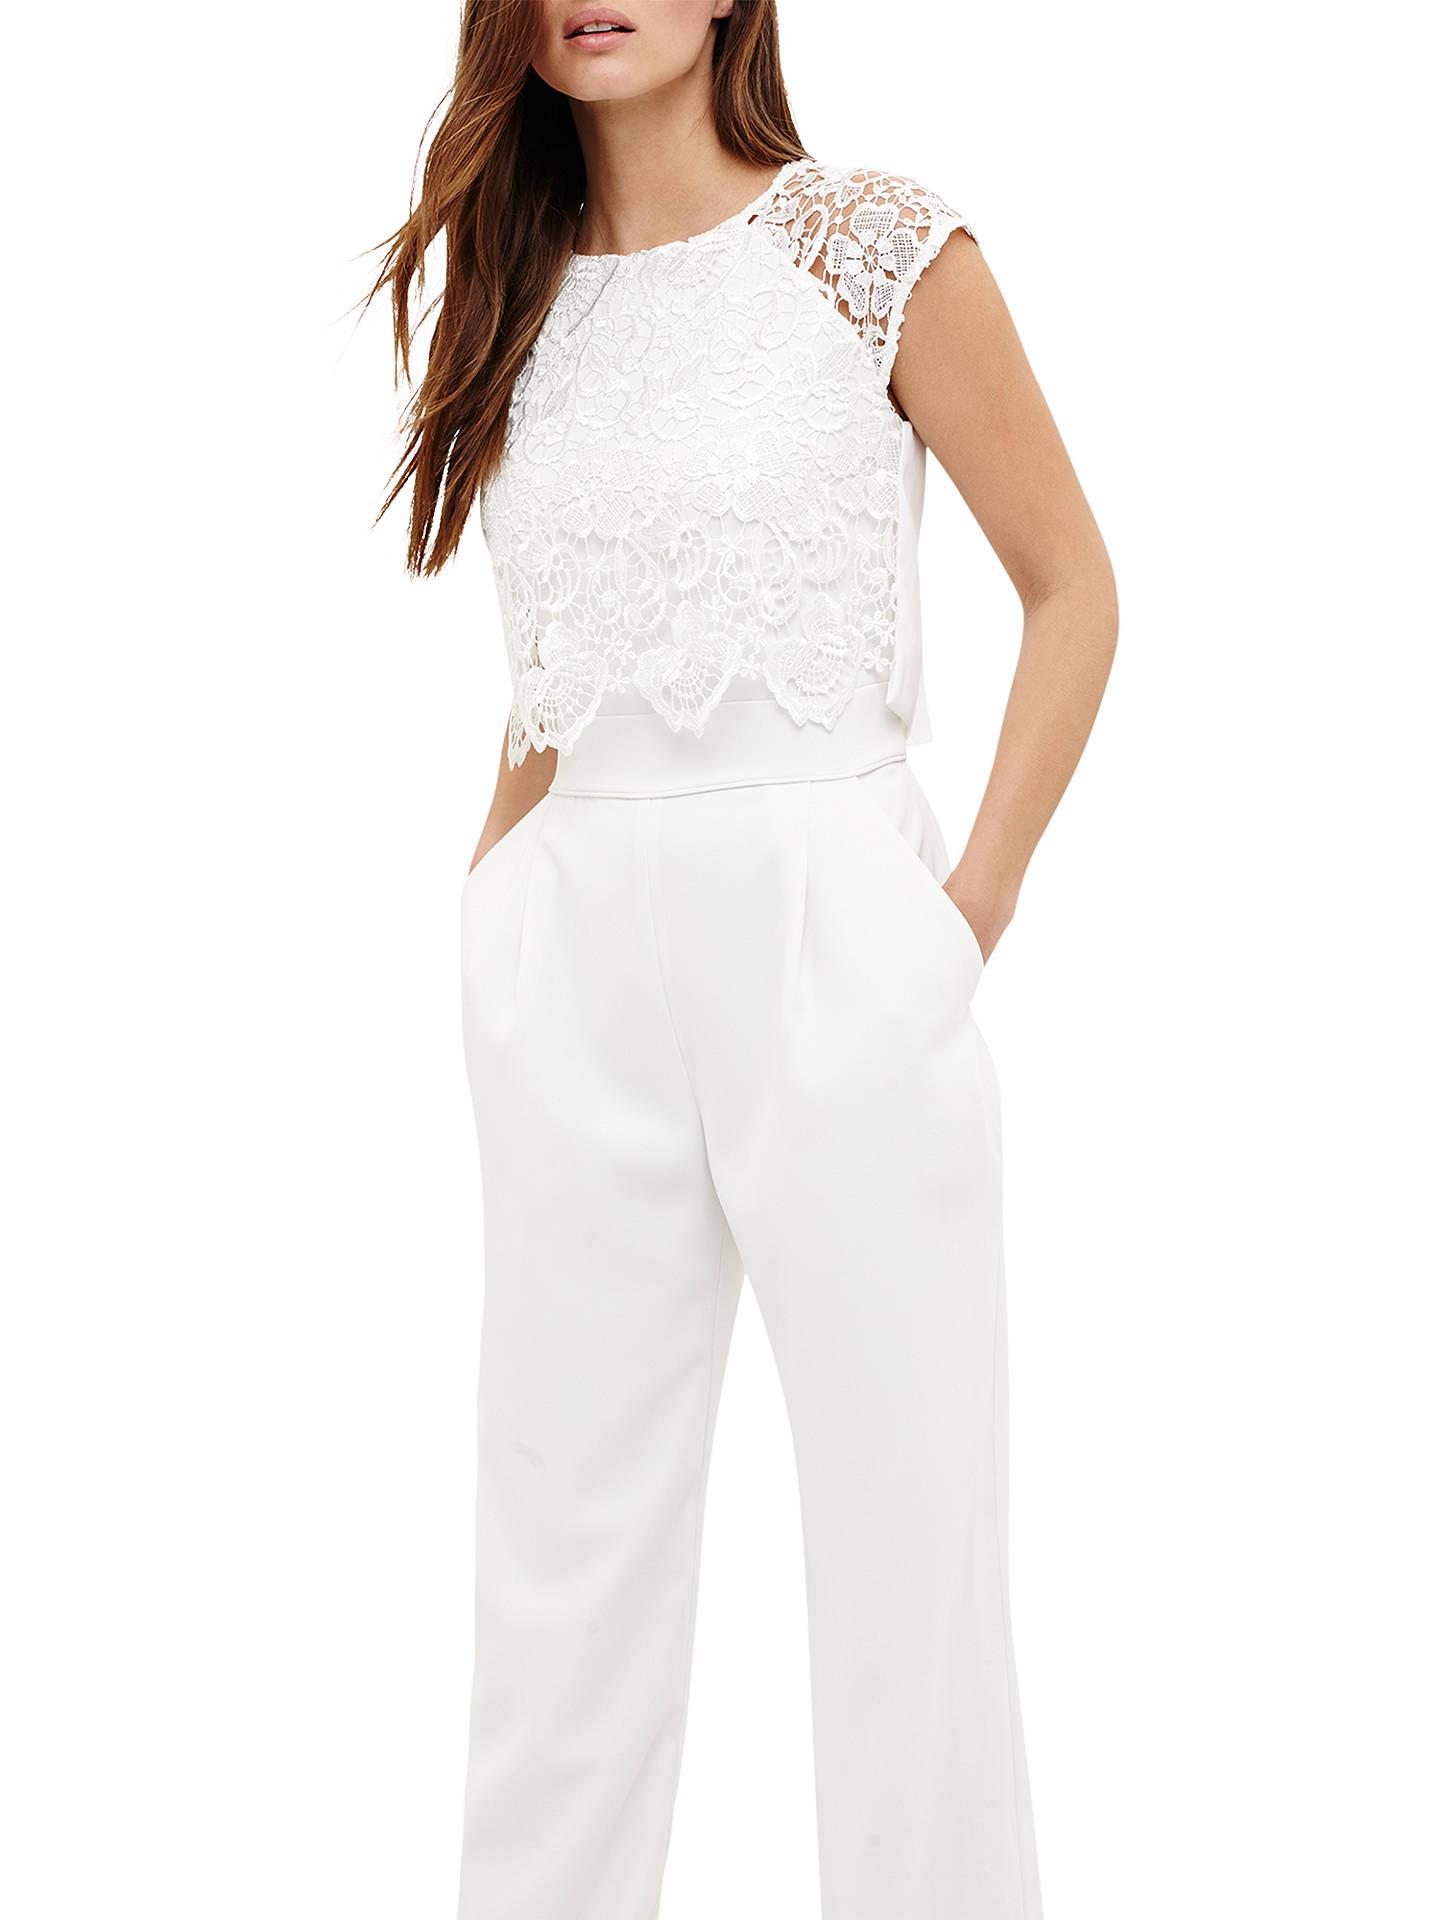 60c775d19 Buy Phase Eight Cortine Jumpsuit, Cream, 6 Online at johnlewis.com ...